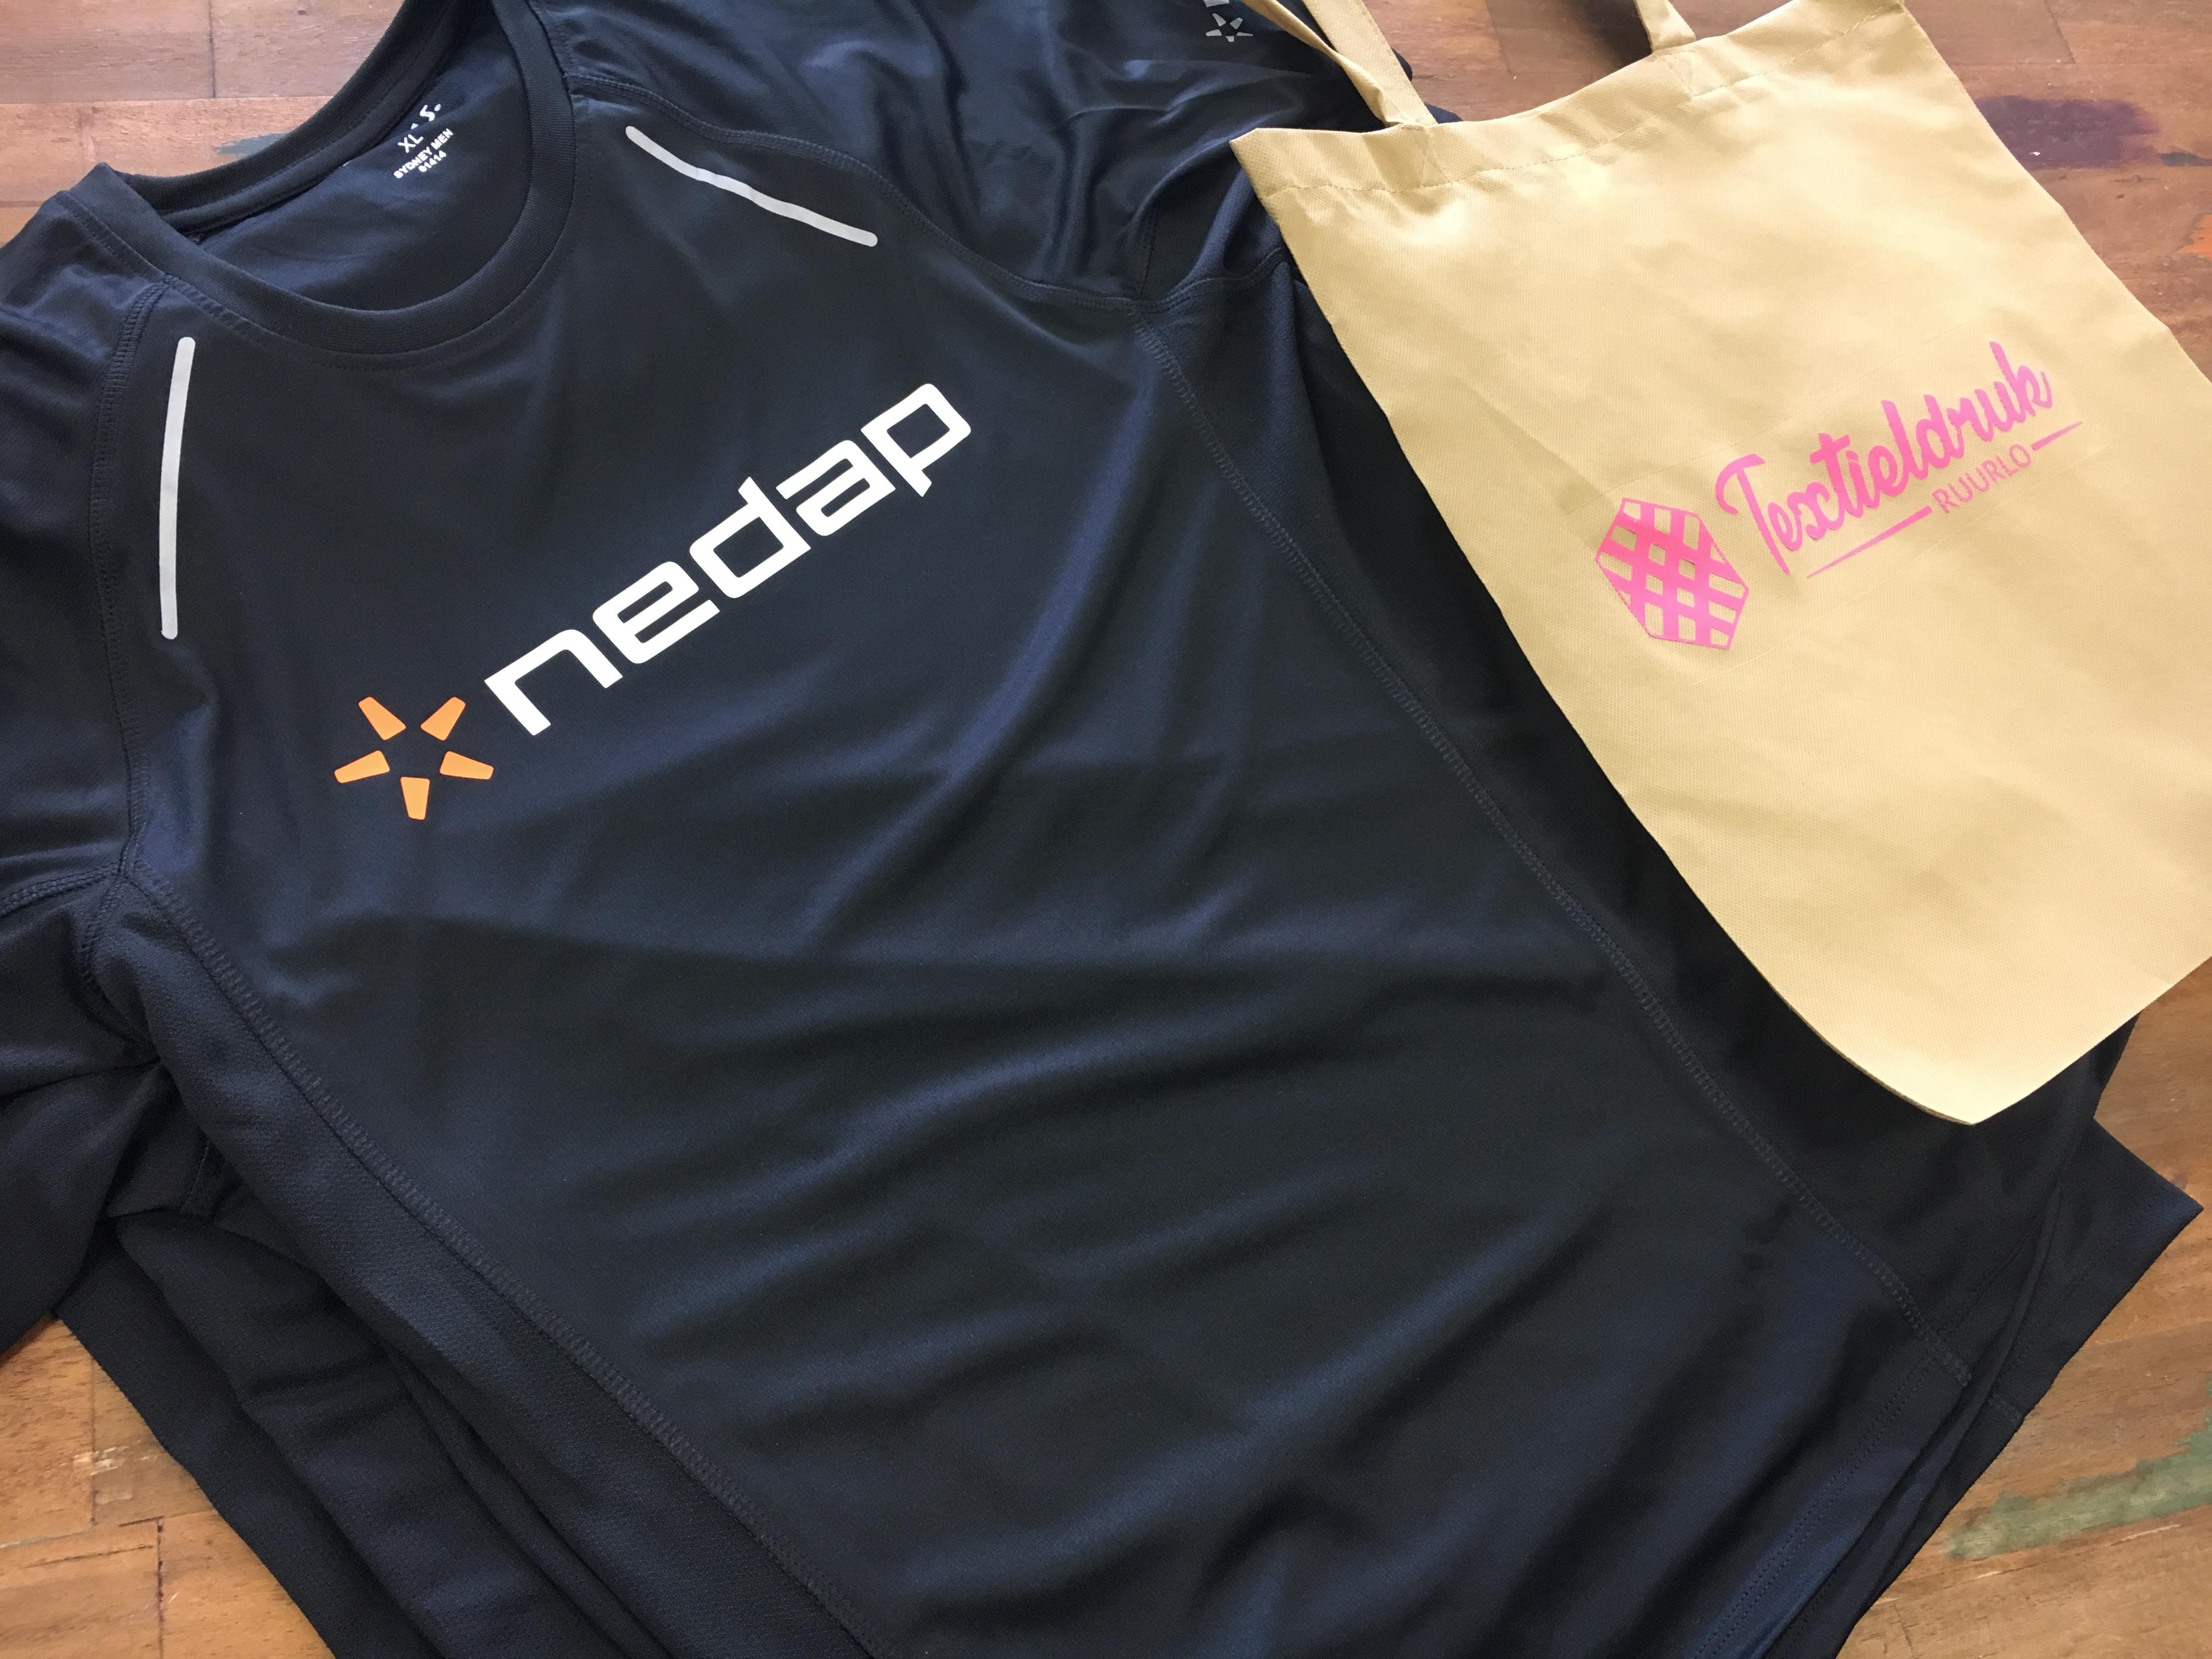 bedrukte sport shirts Nedap 3